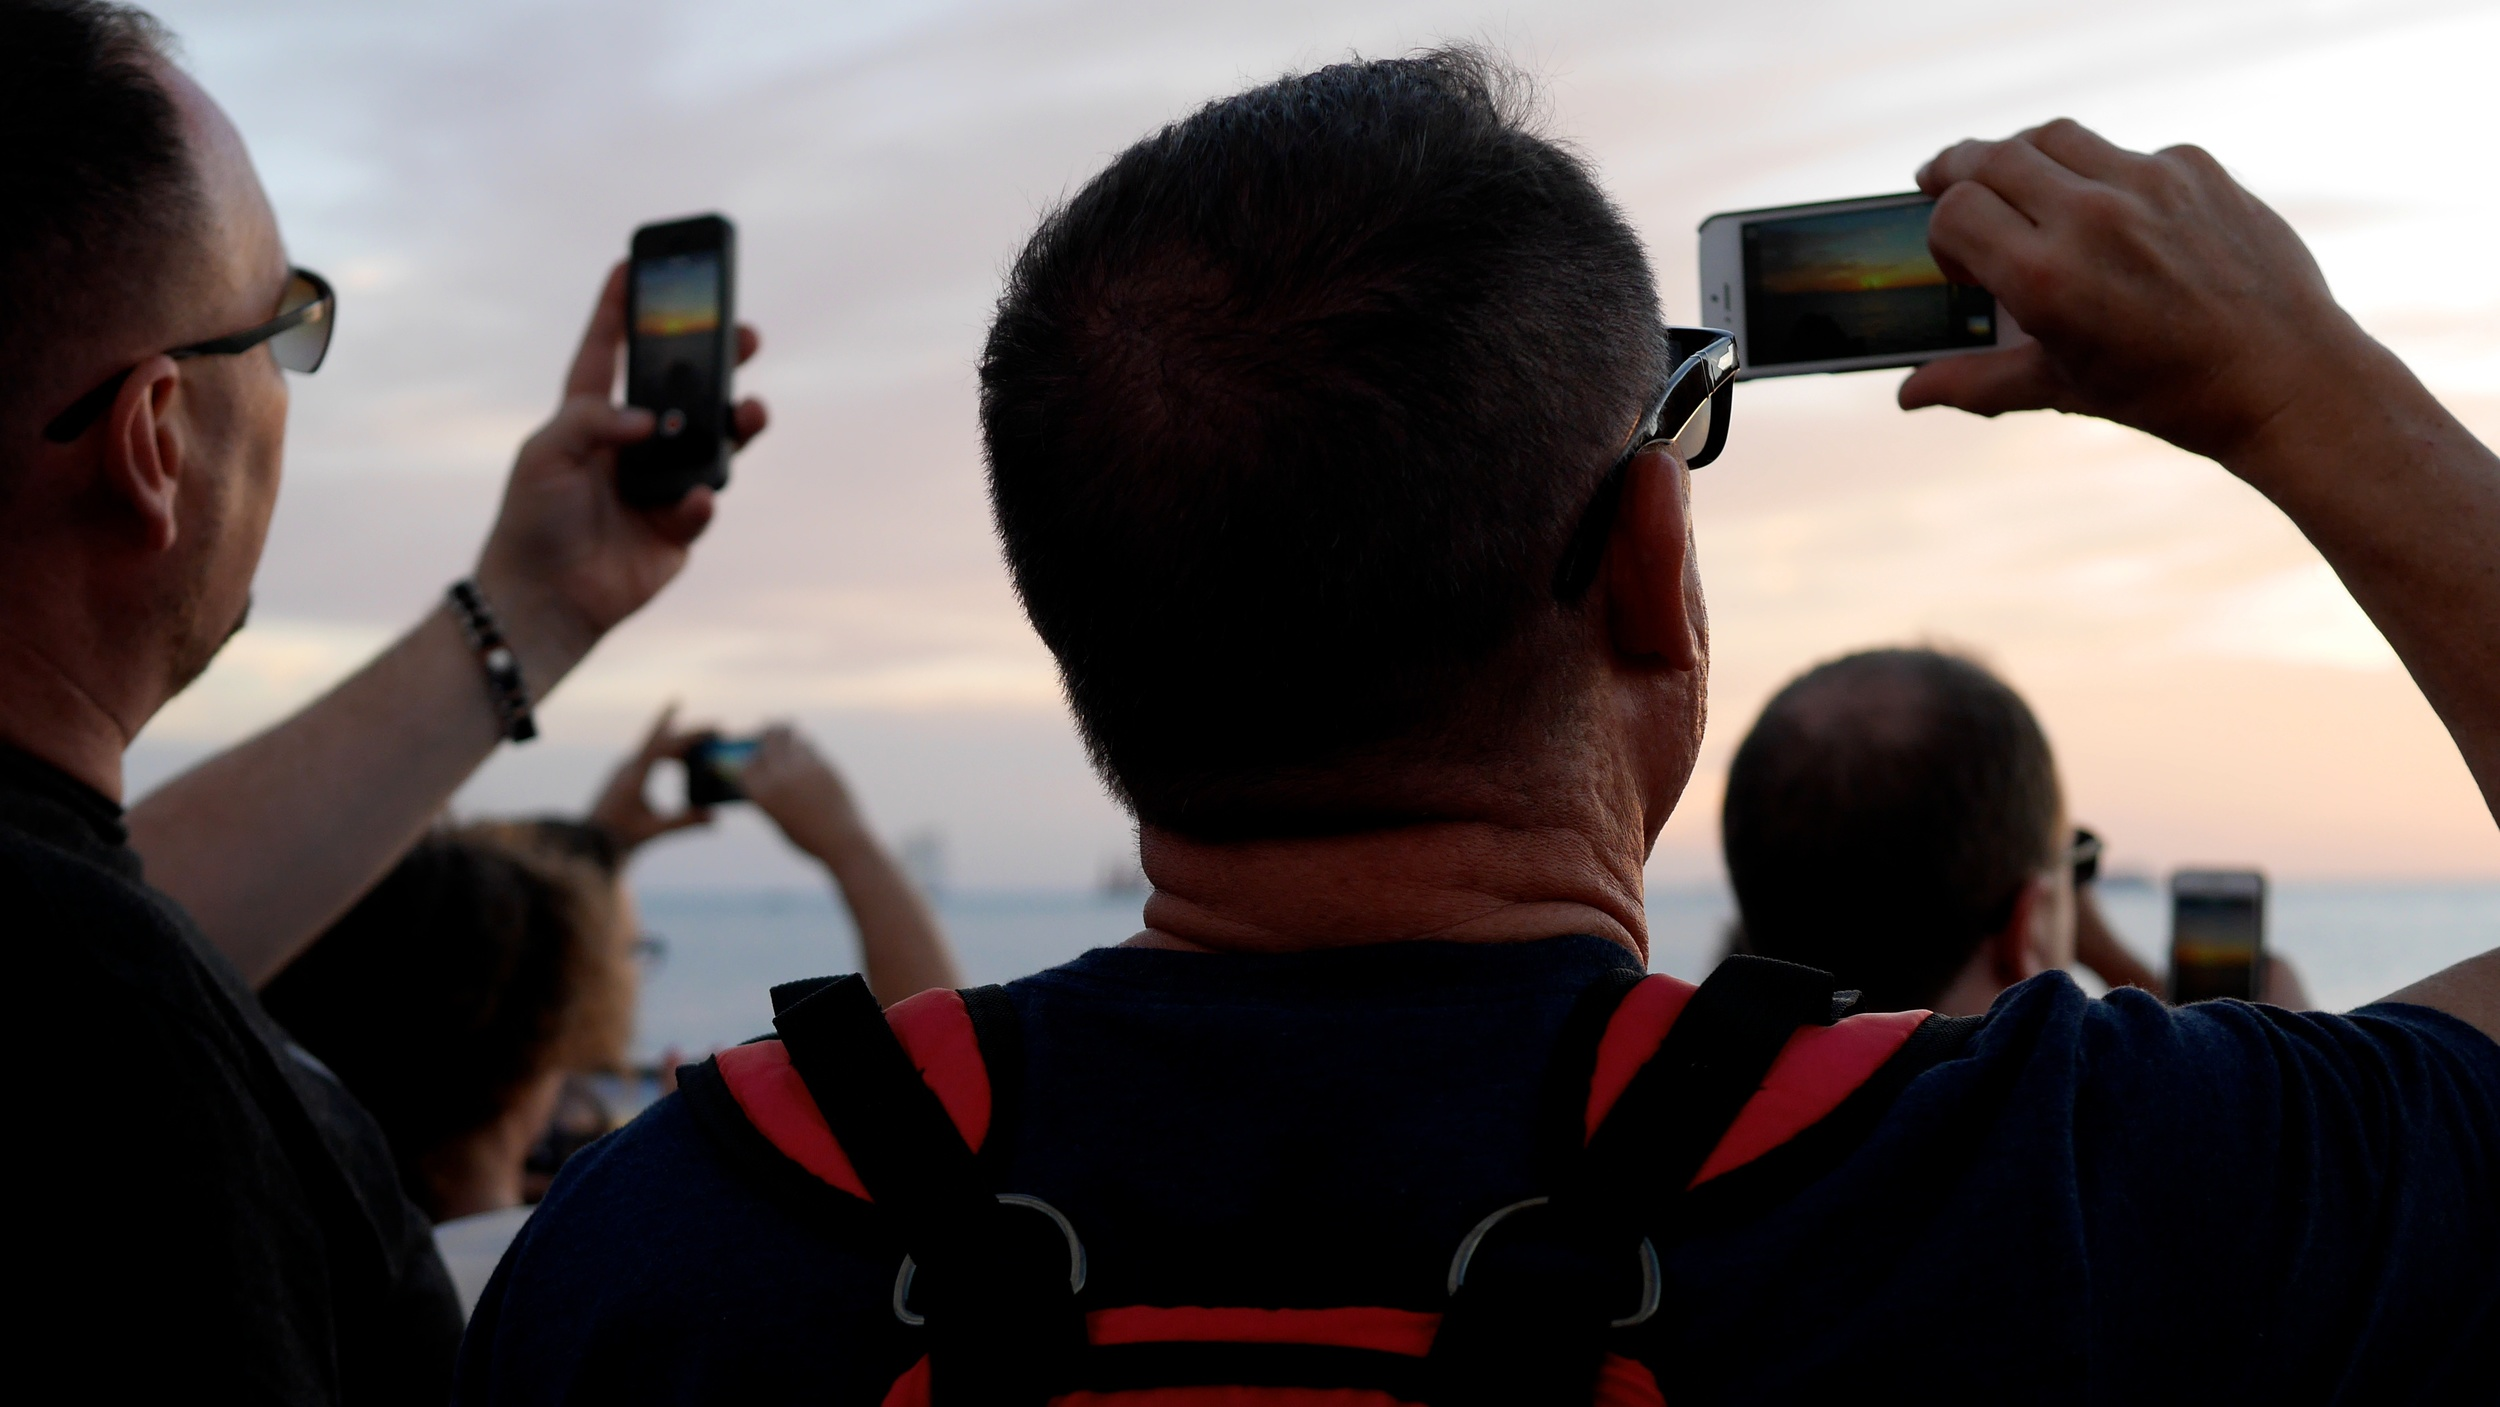 Smart Phone Sunset